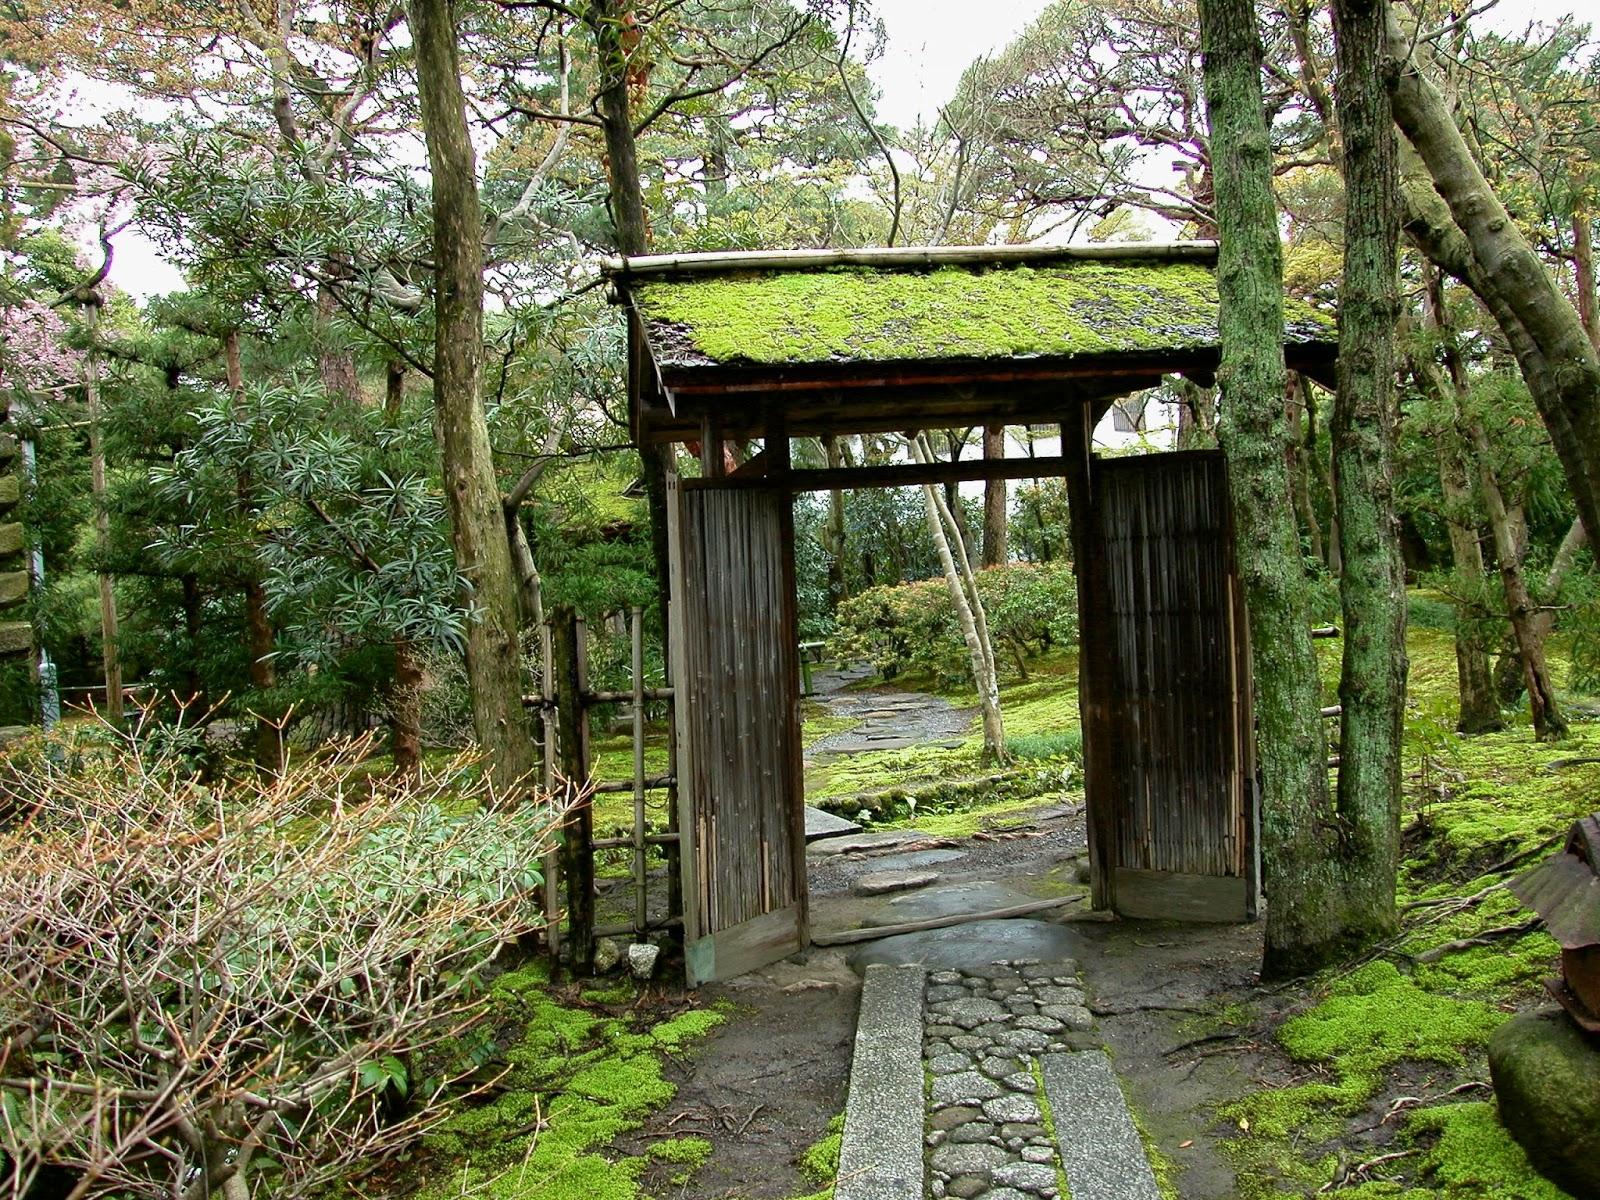 Robert Ketchell's Blog: 'Hide And Reveal' (Miegakure